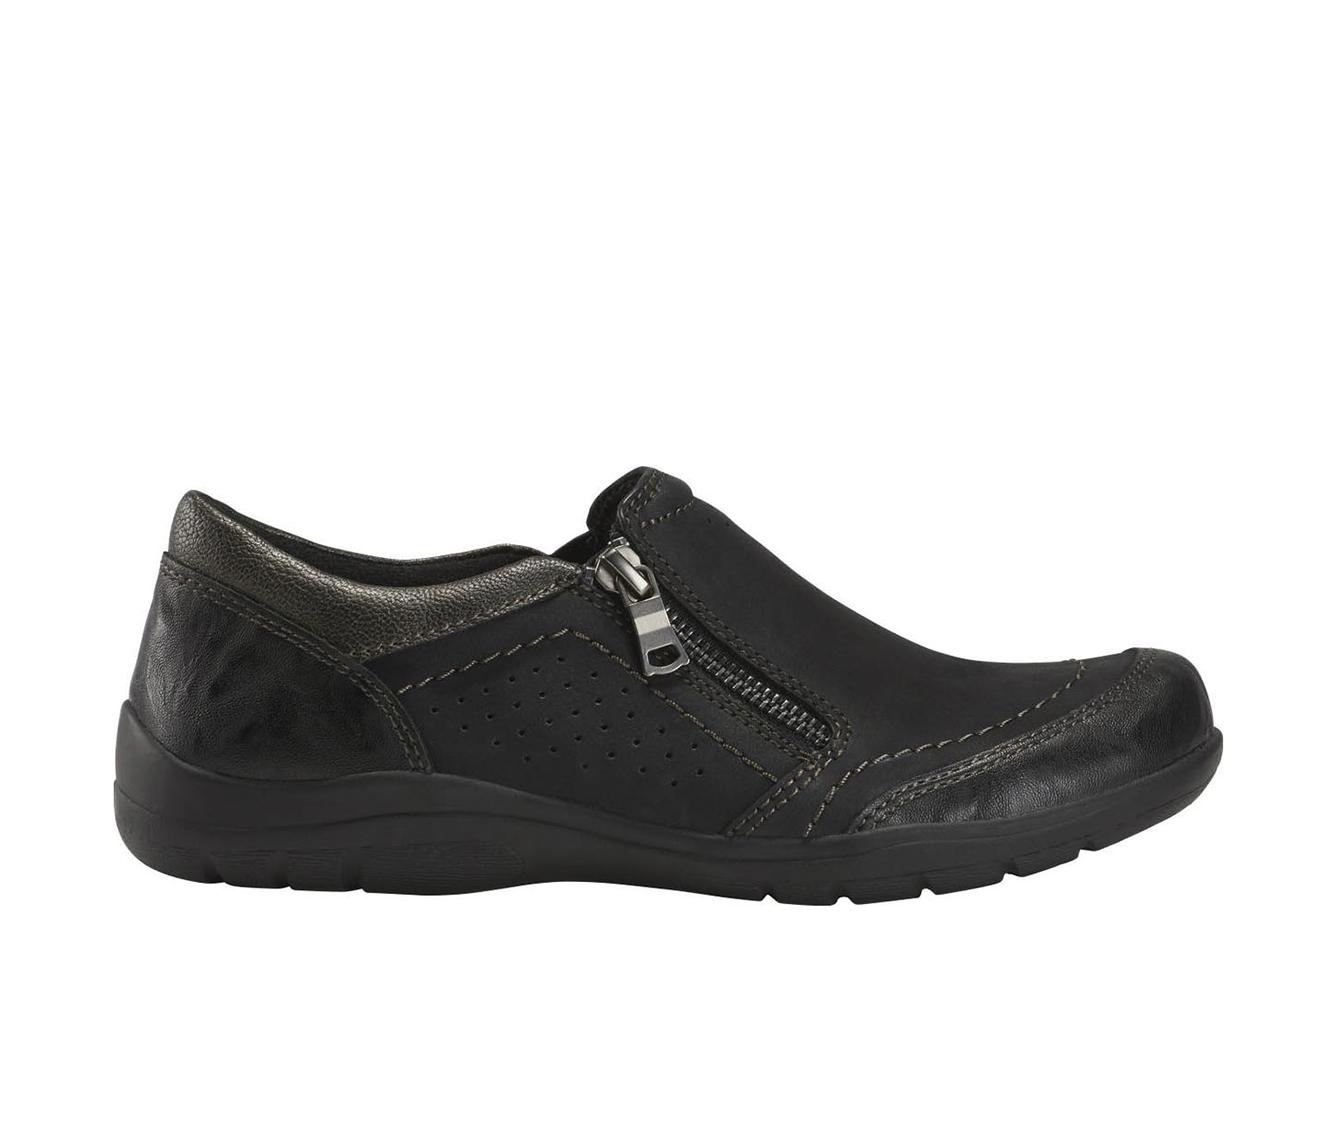 Earth Origins Rapid 2 Randall Women's Shoe (Black Leather)